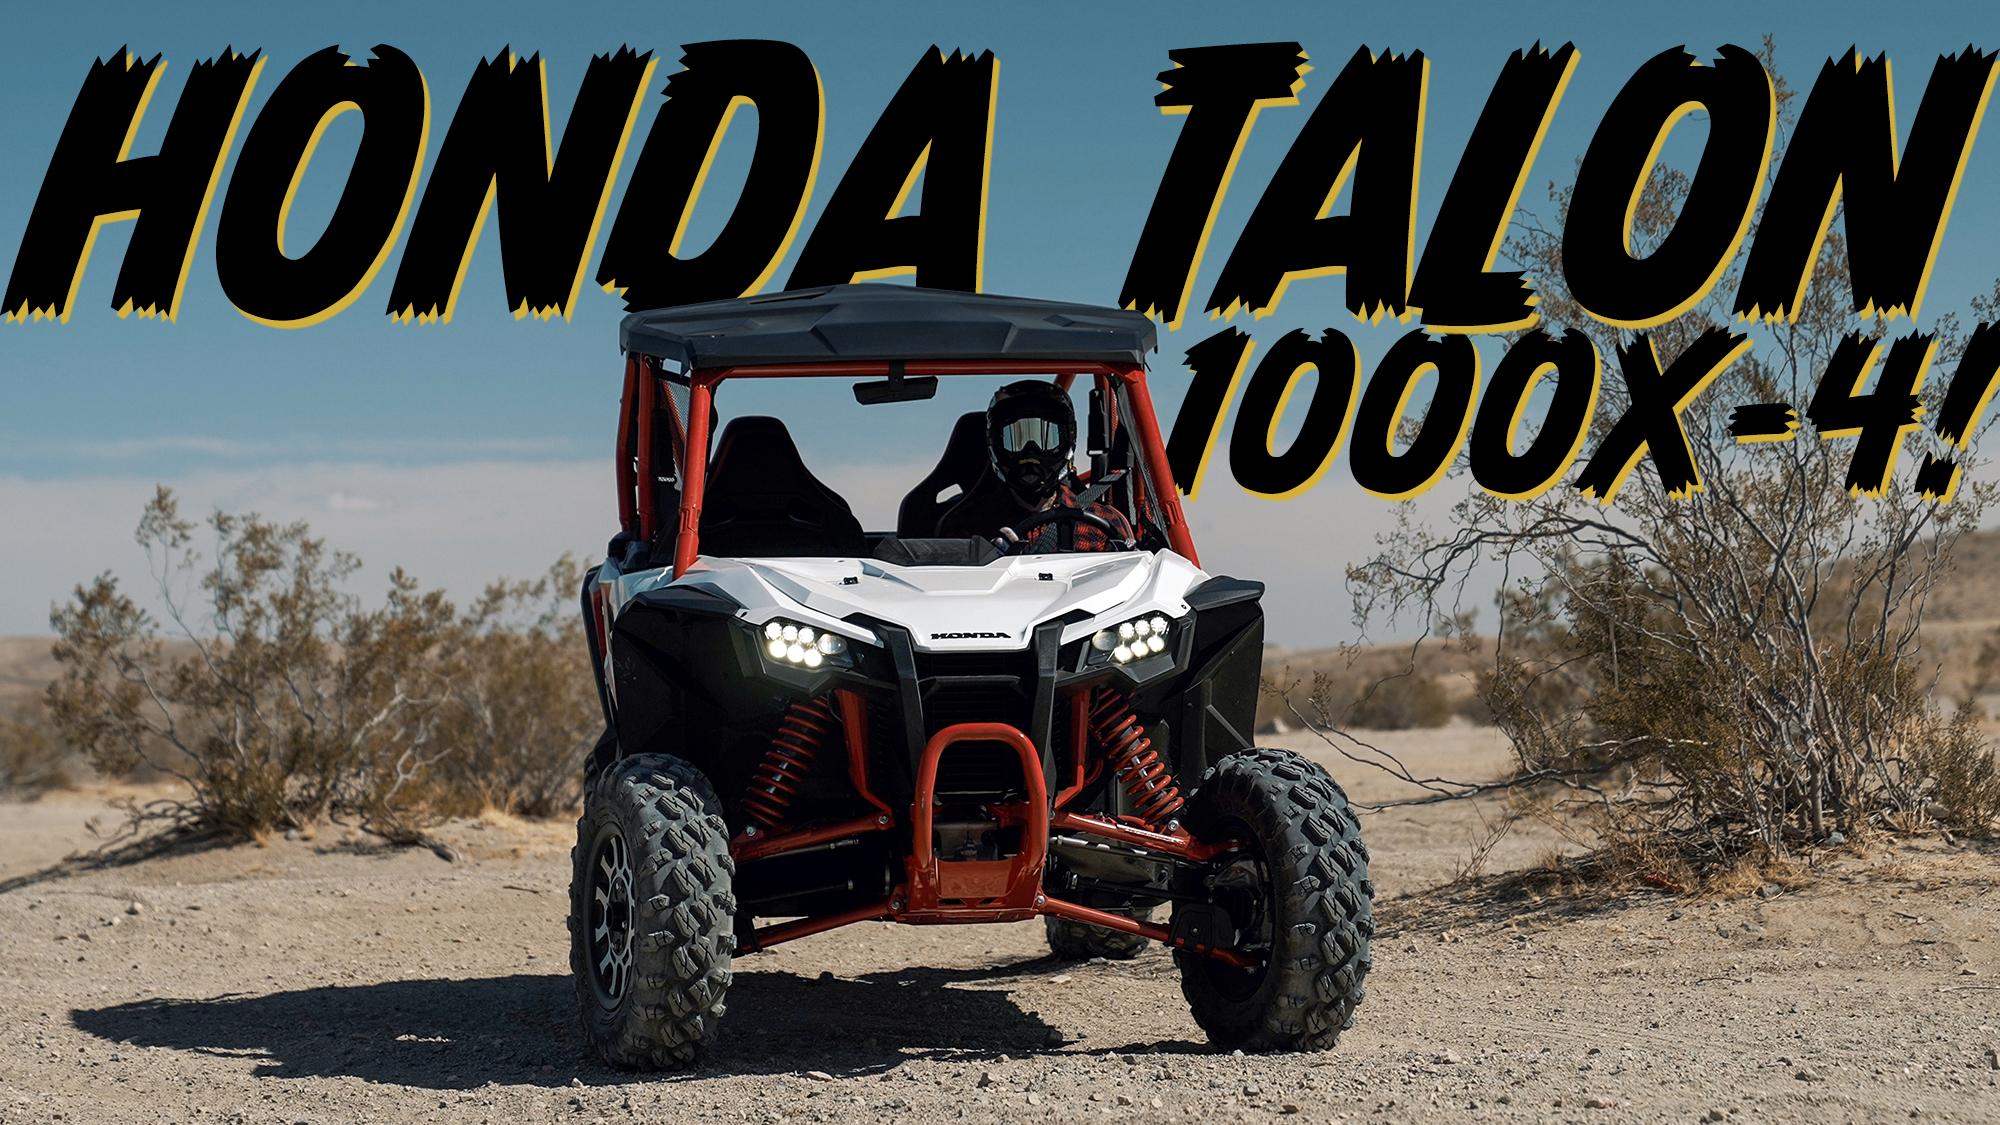 Honda Talon 1000x-4 off-road